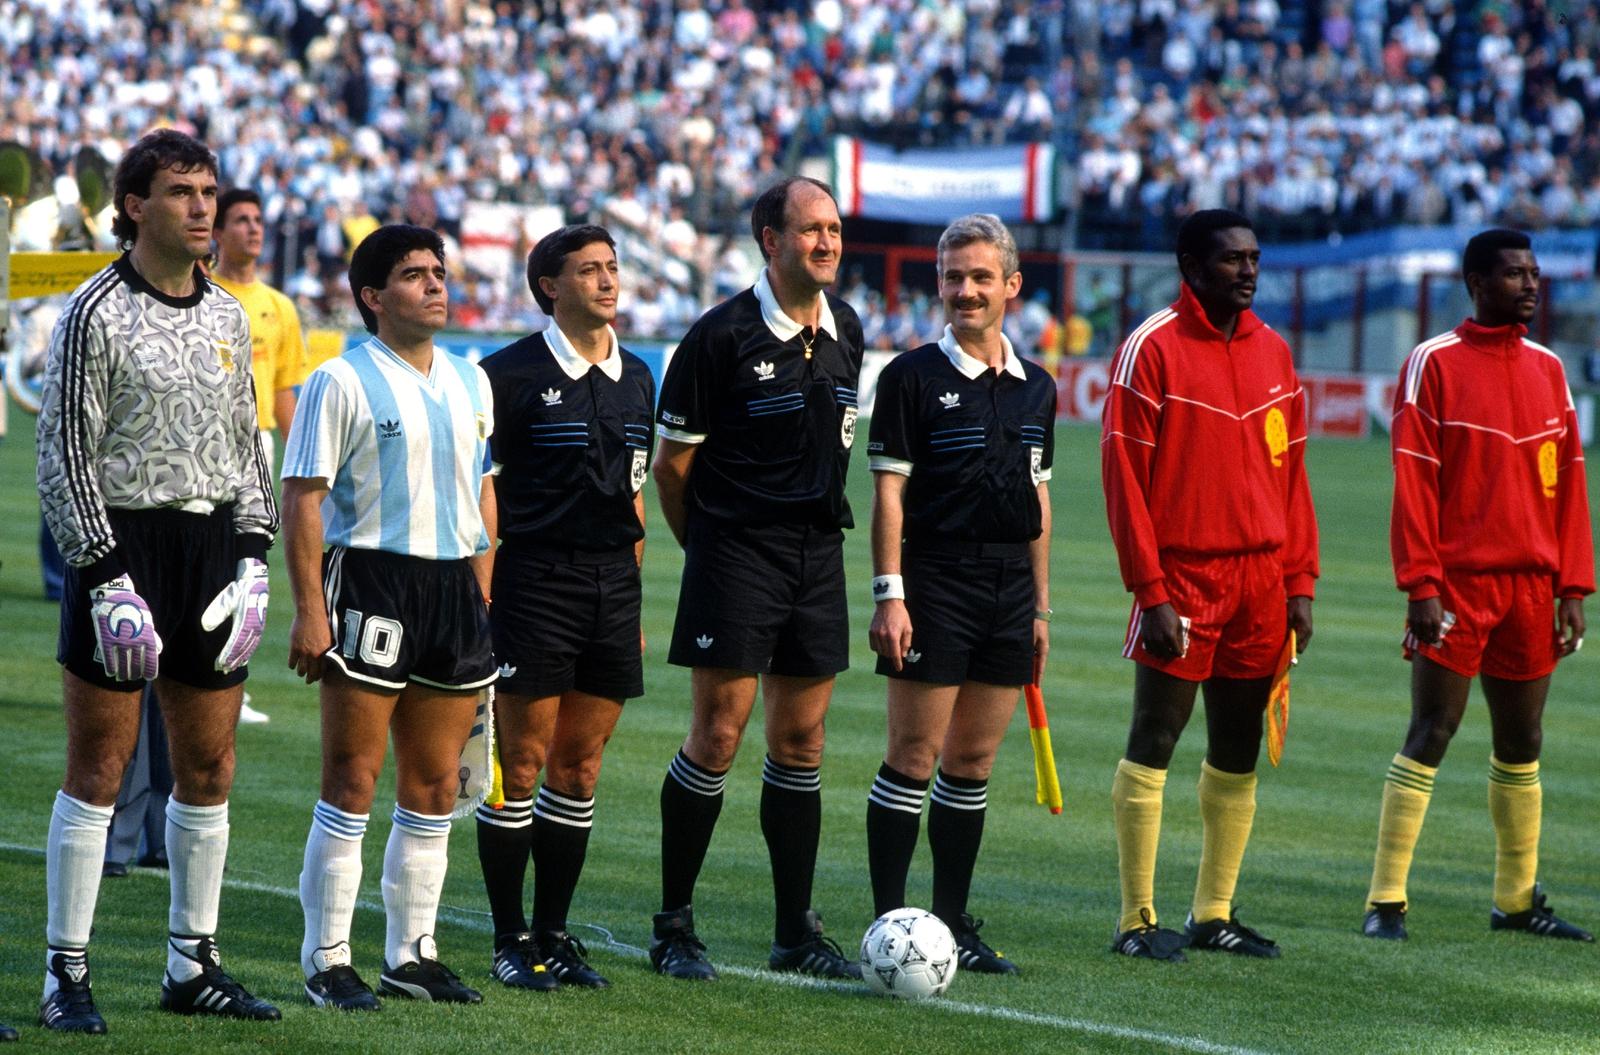 Image - Nery Pumpido, Diego Maradona of Argentina, assistant referee Vincent Mauro, referee Michael Vautrot, assistant referee Michal Listkiewicz and Stephen Tataw of Cameroon